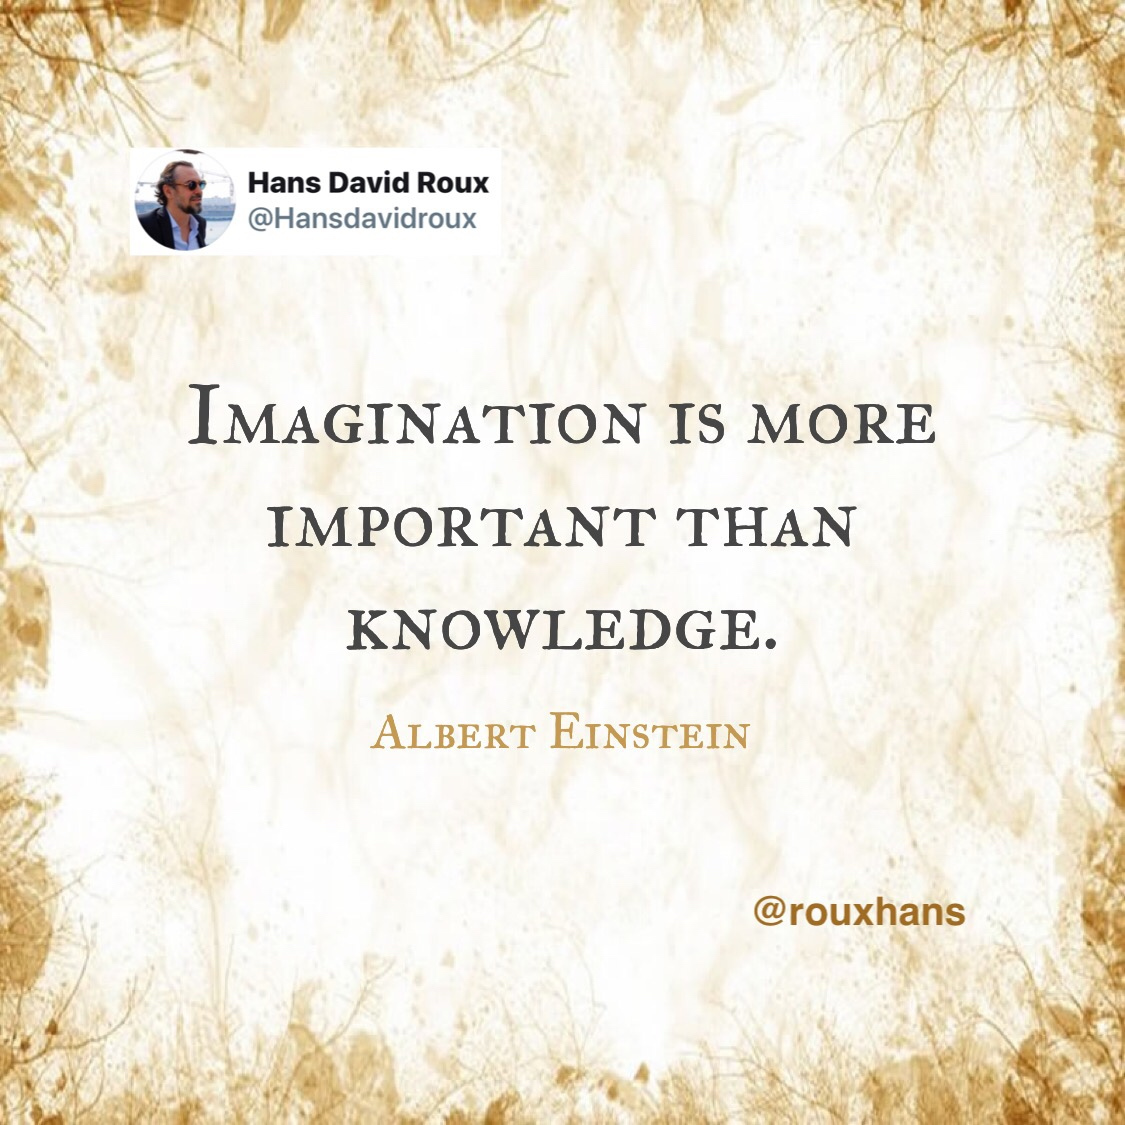 #grateful #inthemoment #inthenow #aware #mindful #mindfulness #meditation #love #mindset #selfcare #selflove #mindfulliving #mentalhealth #wellness #motivation #meditate #inspiration #life #gratitude #peace #happiness #health #mind #awareness #breathe #positivity #happy #spirit https://t.co/5L7LcFHfVy